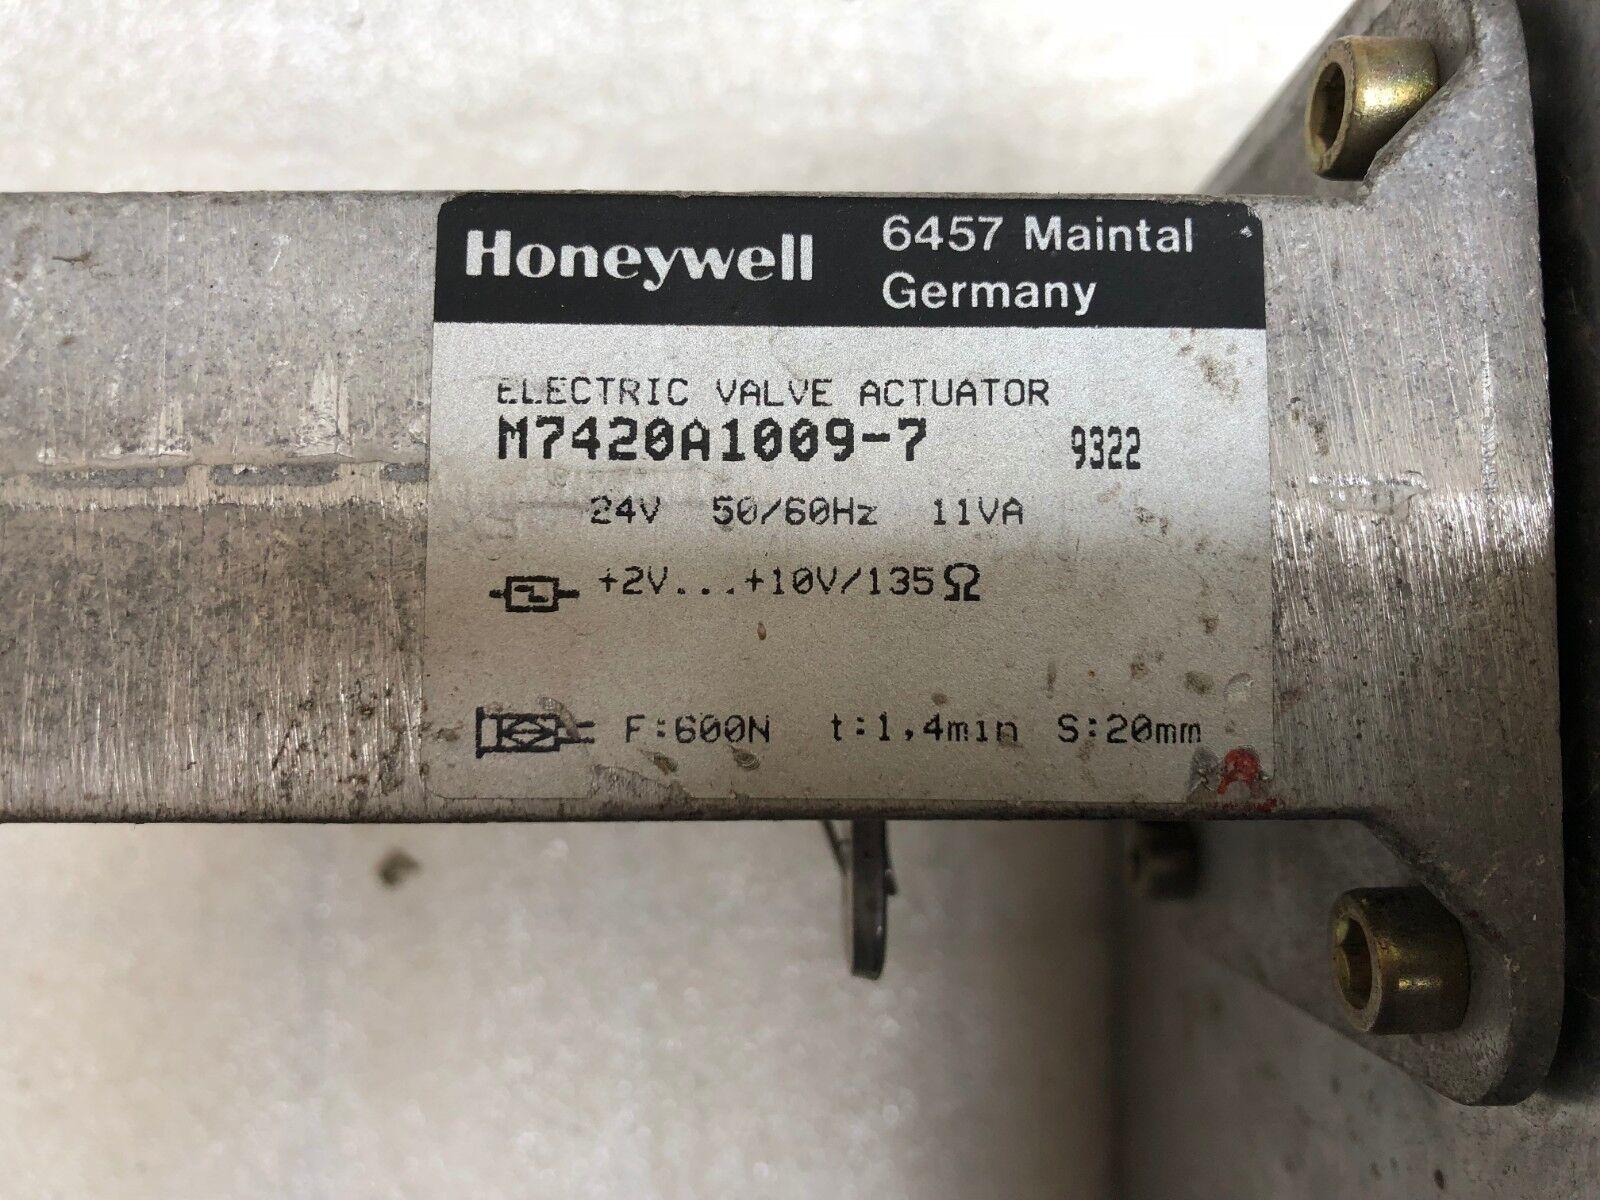 HONEYWELL  - Ventilantrieb    - Stellantrieb M7420A1009-7 5a2a54